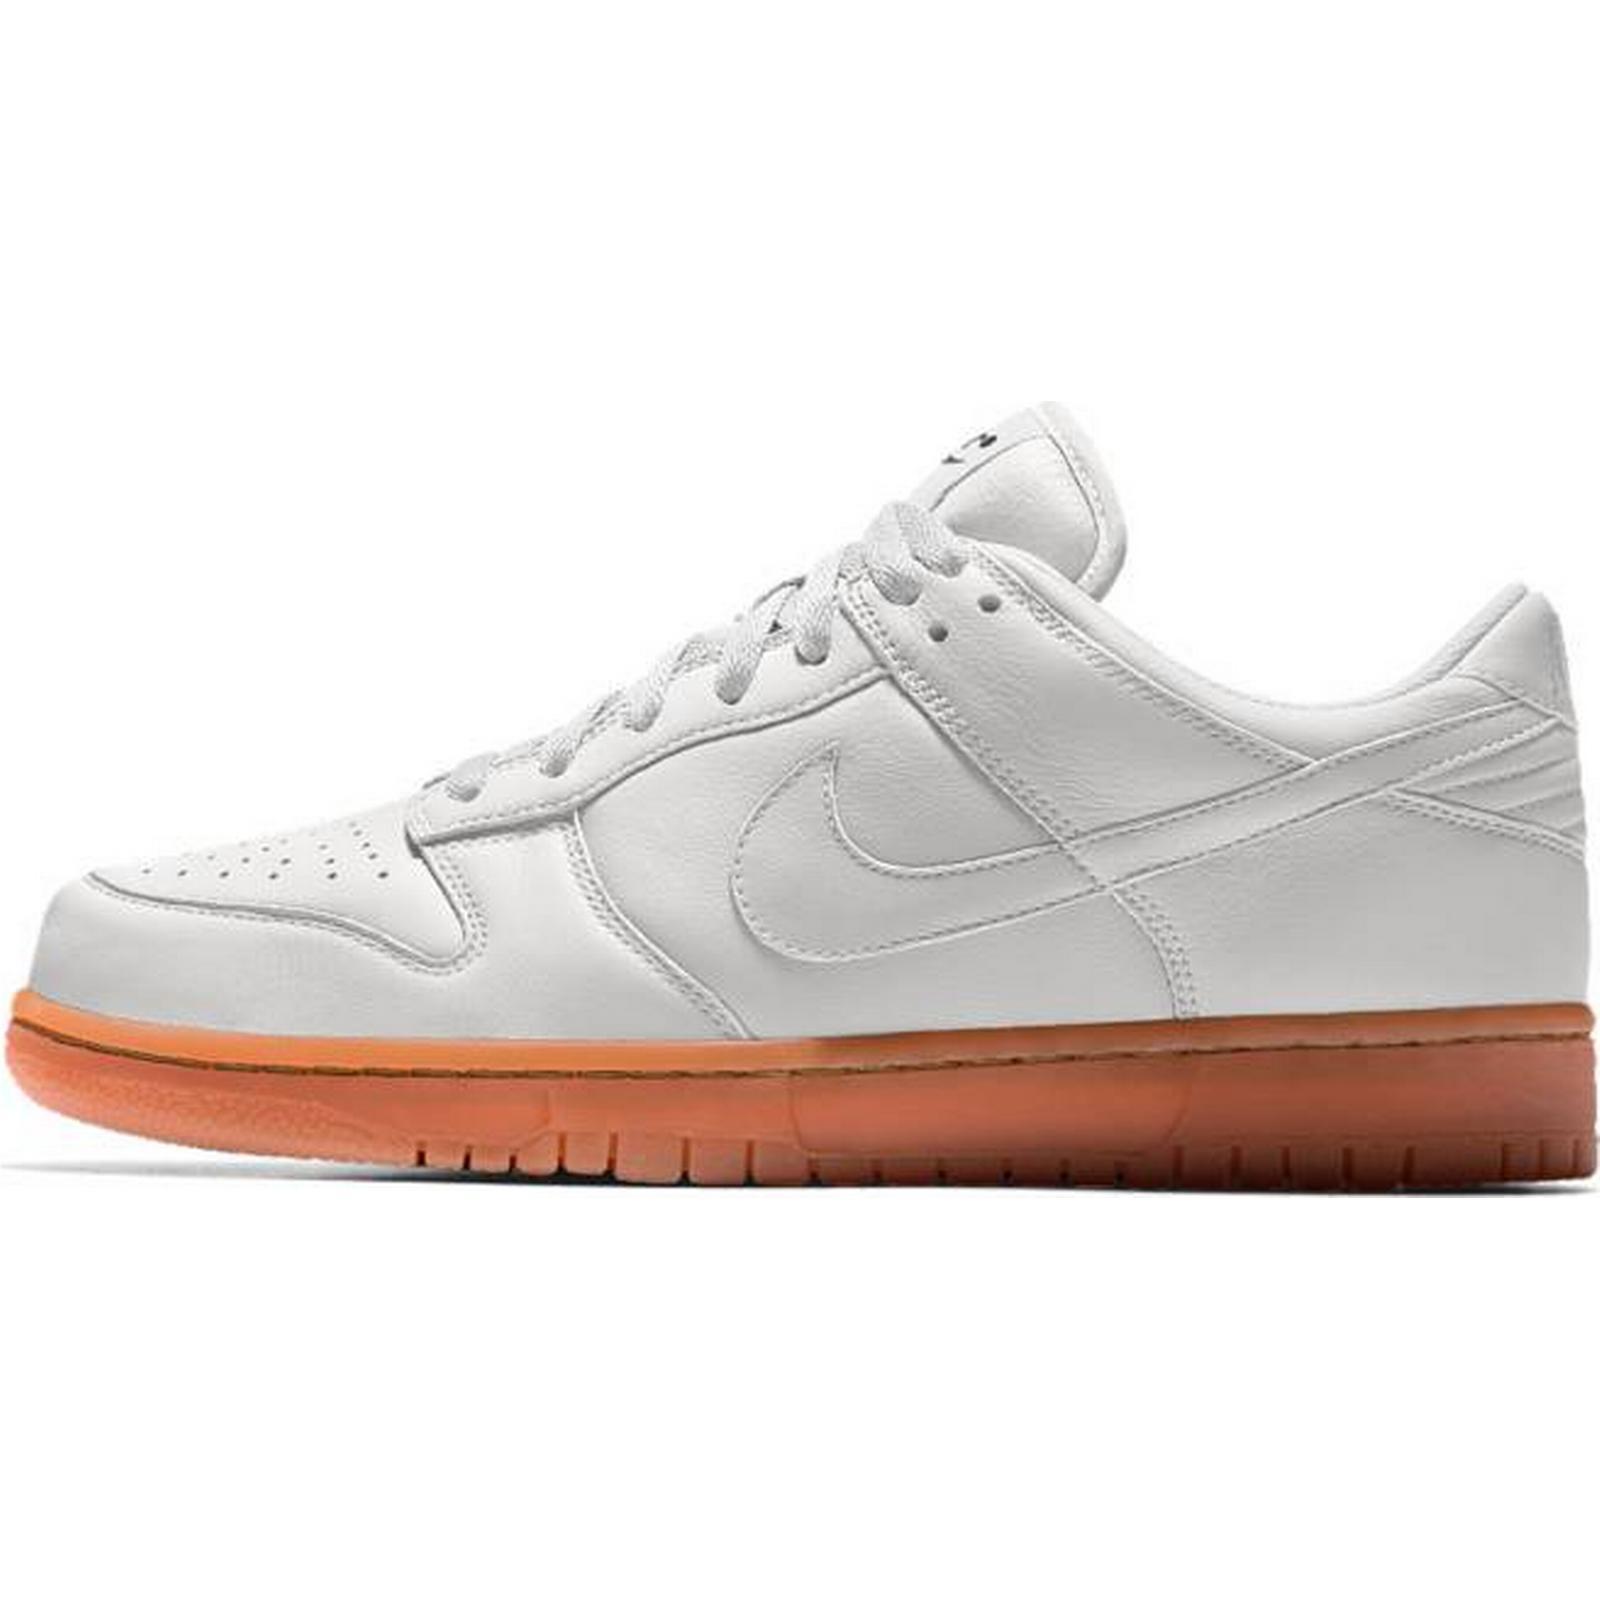 sports shoes df932 0b7e9 ... discount nike mskie buty mskie nike nike dunk low id 15c4eb 55ae4 339b2  ...